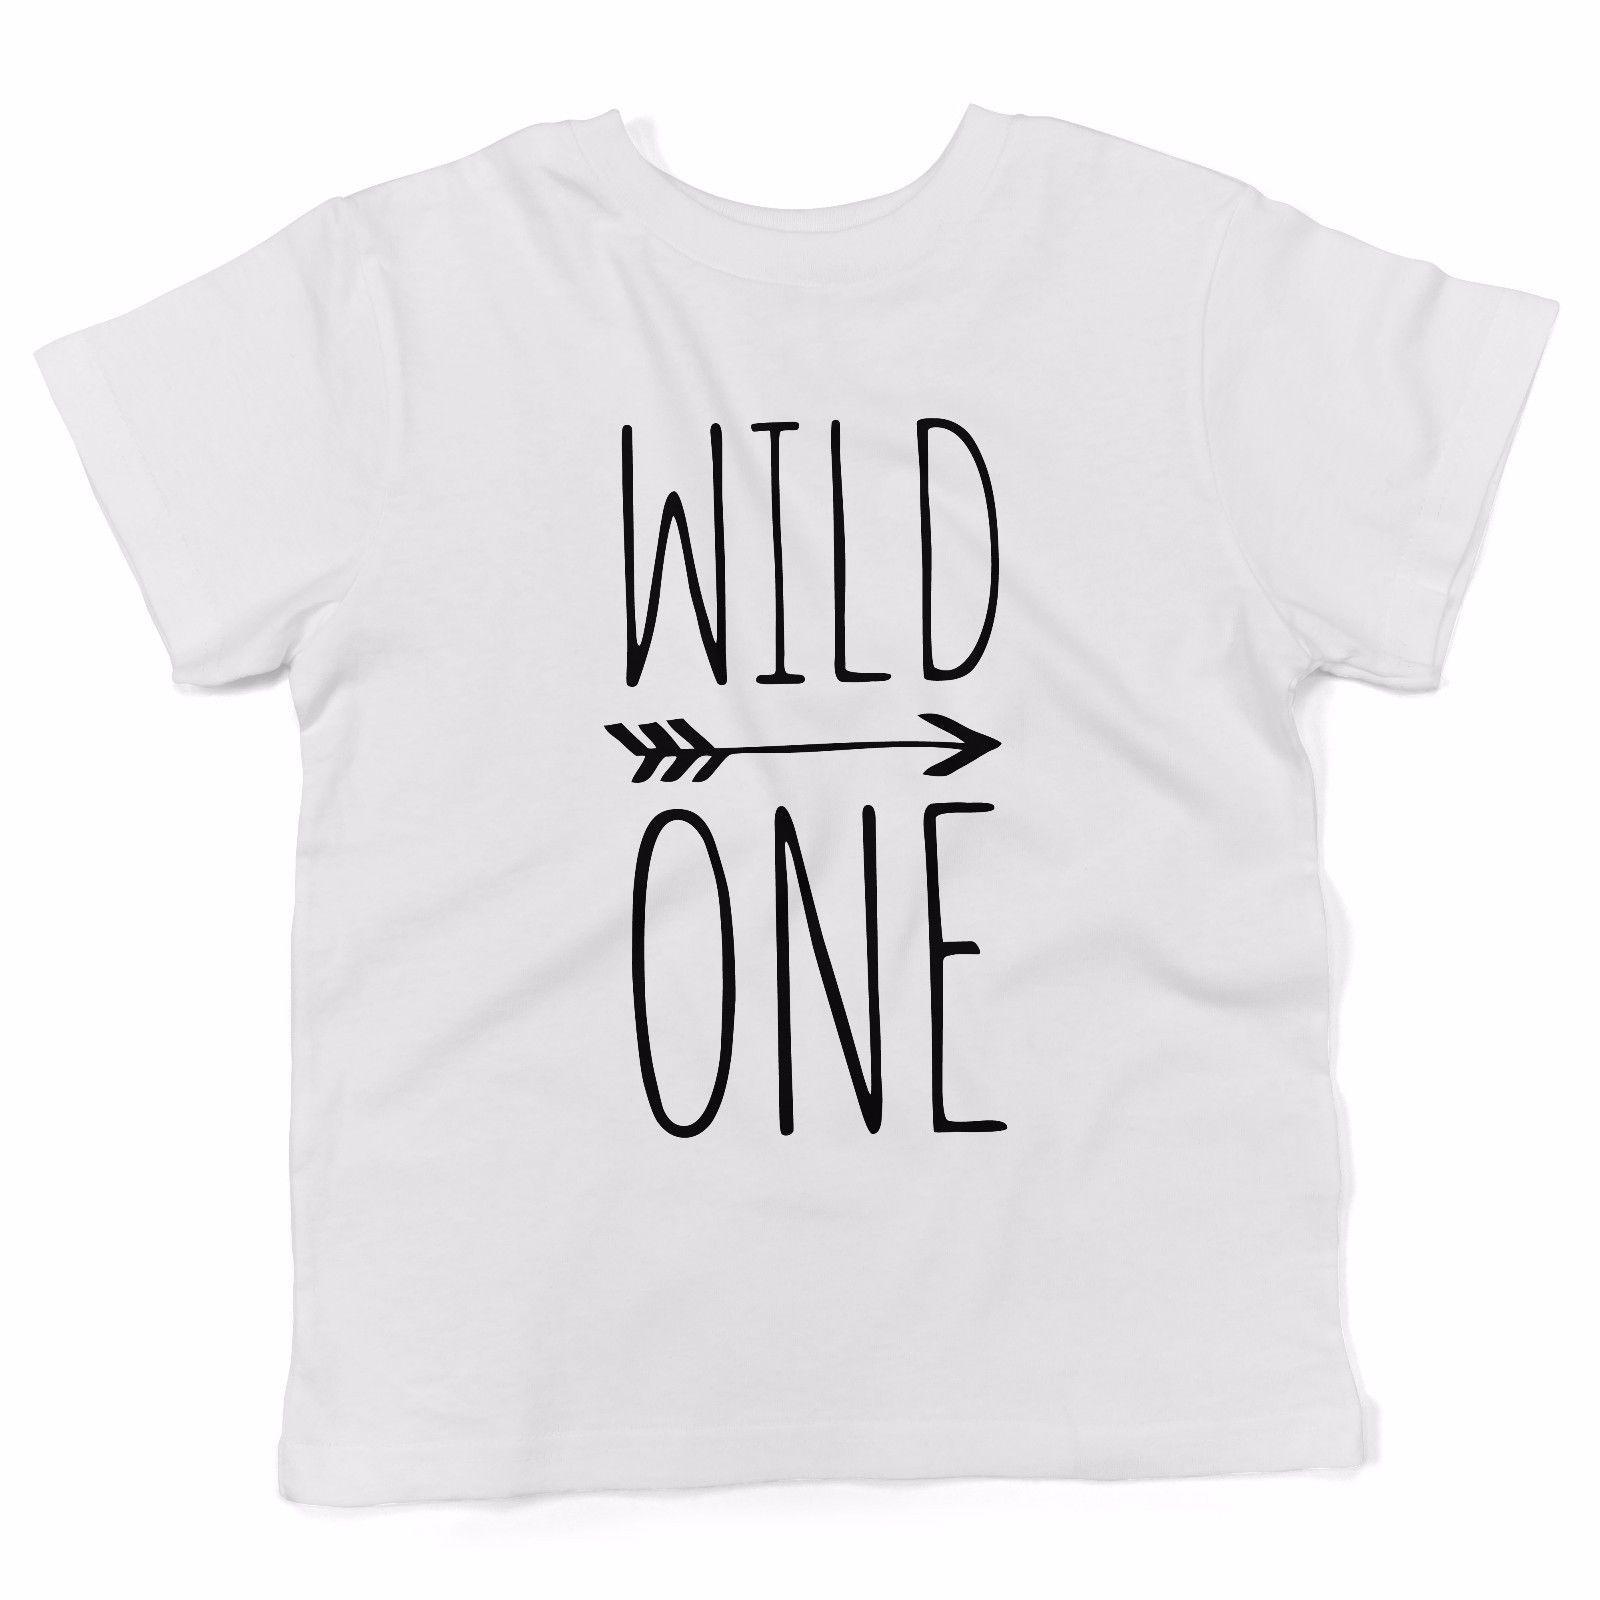 Baby T Shirt Wild One Abbigliamento Neonato Bianco Tees Custom Jersey T Shirt Hoodie Hip Hop T Shirt